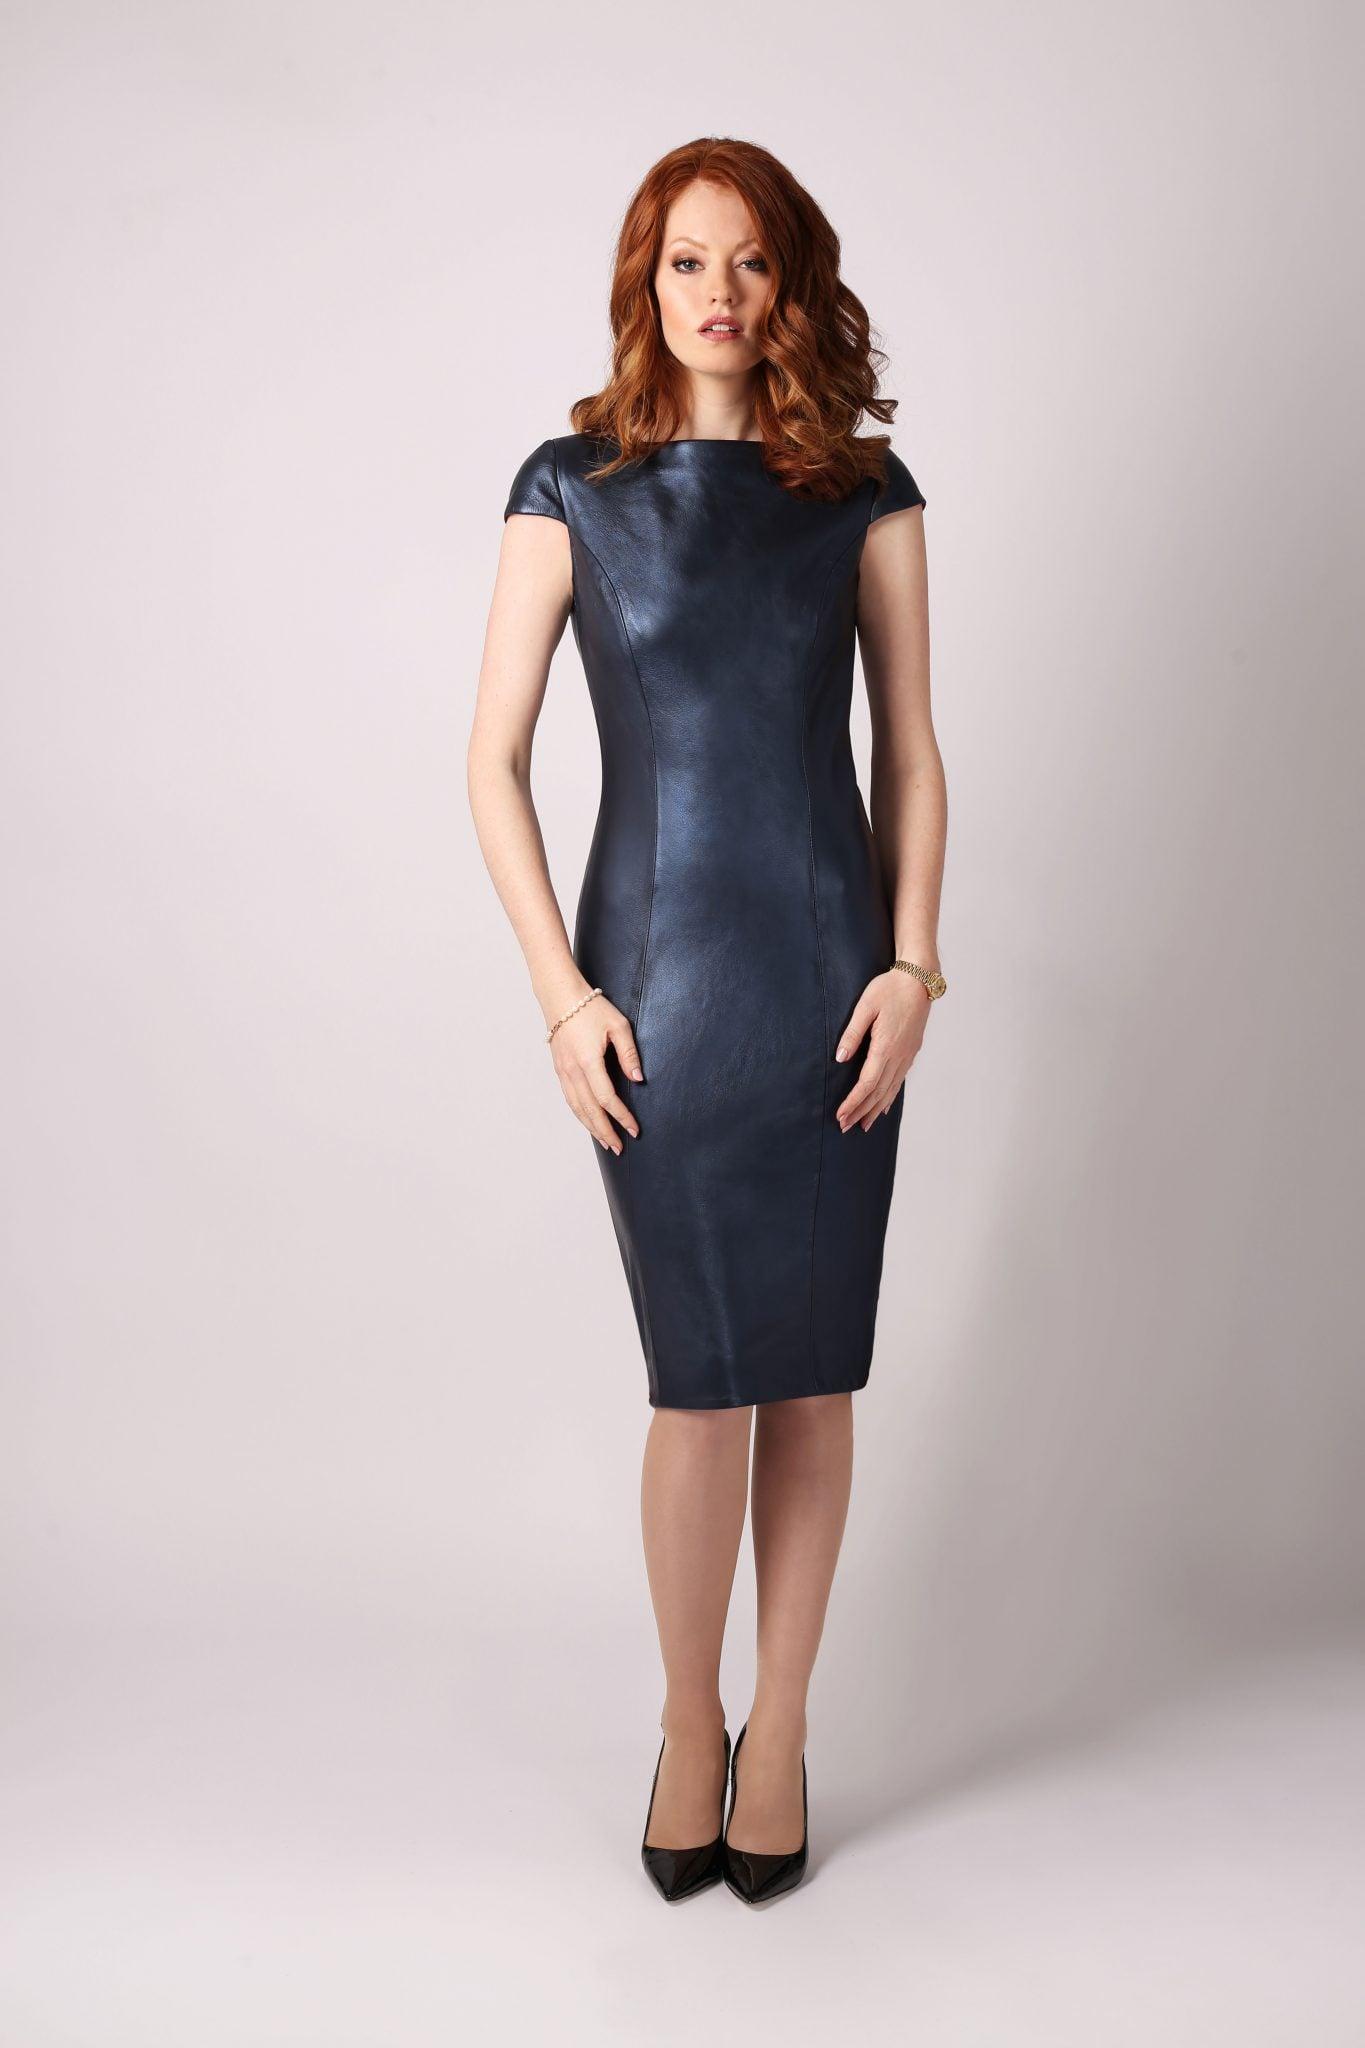 Petrol Blue Metallic Leather Dress